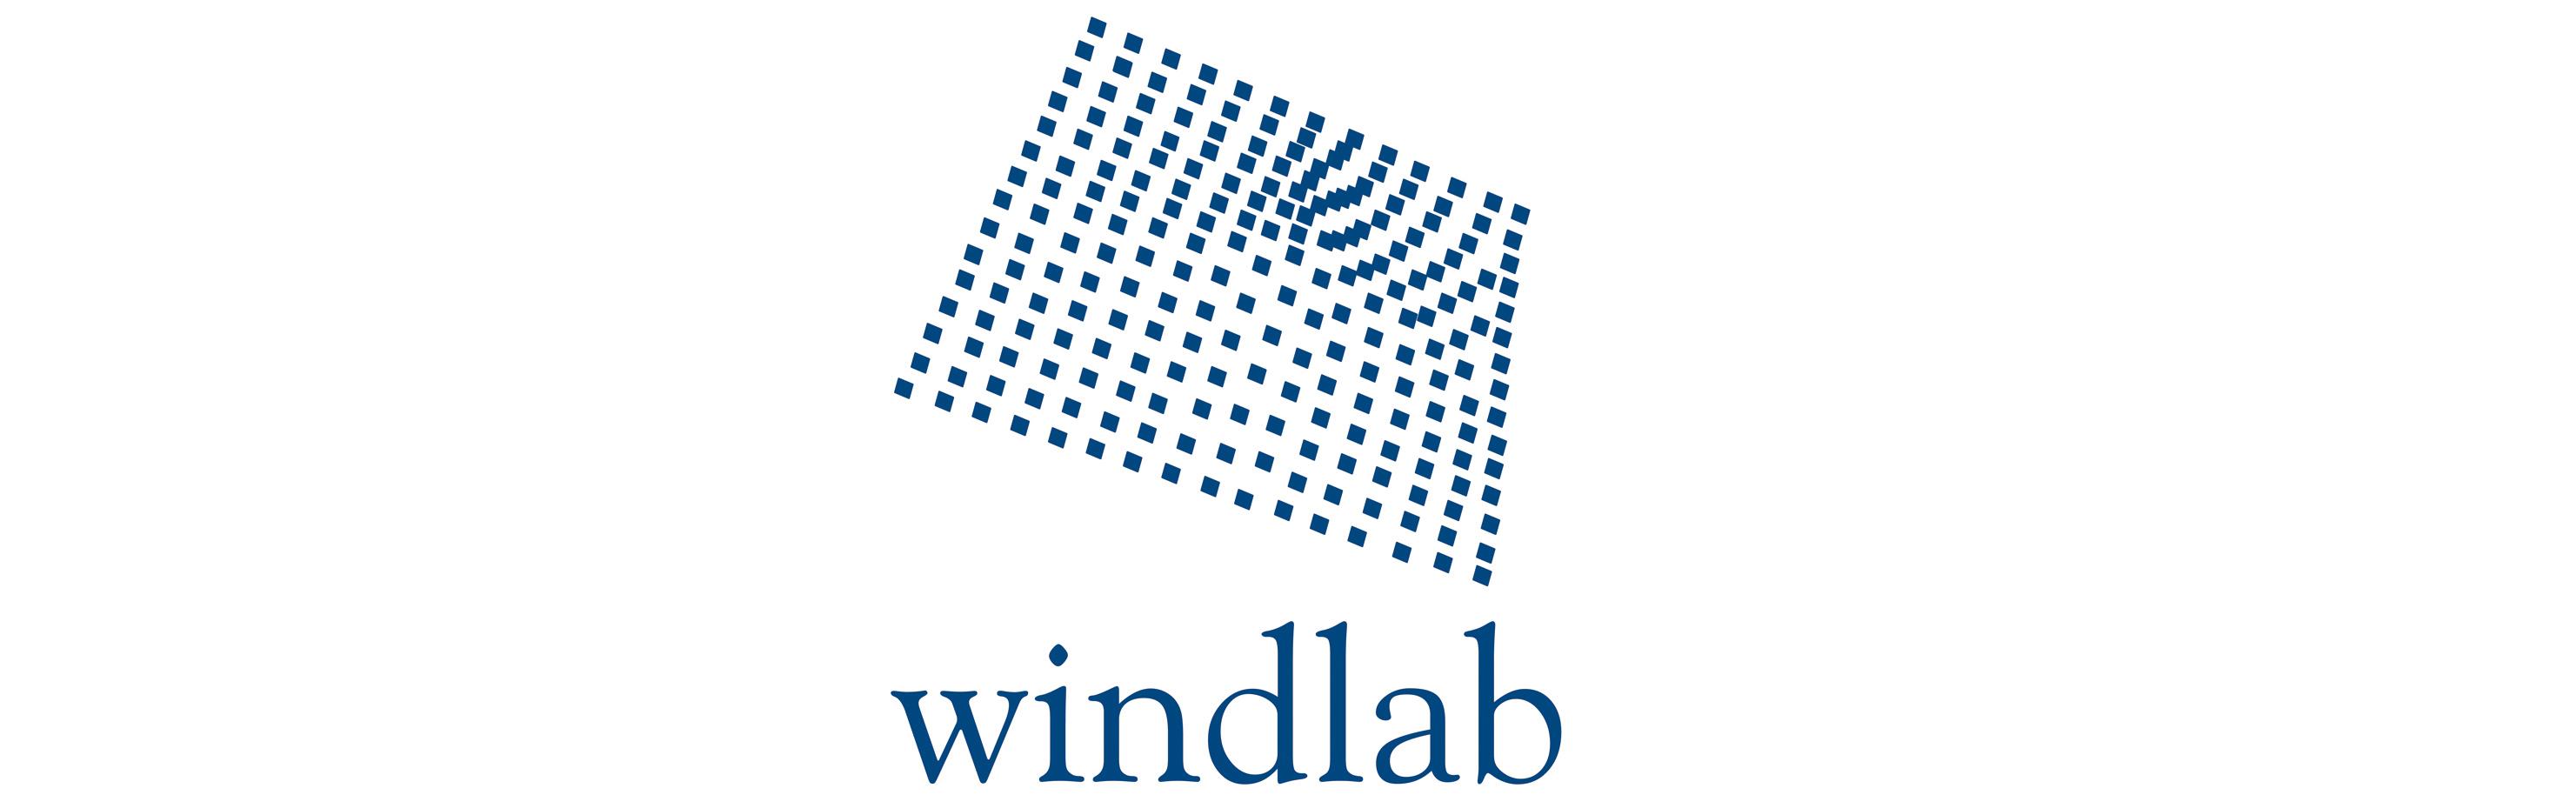 Windlab v2